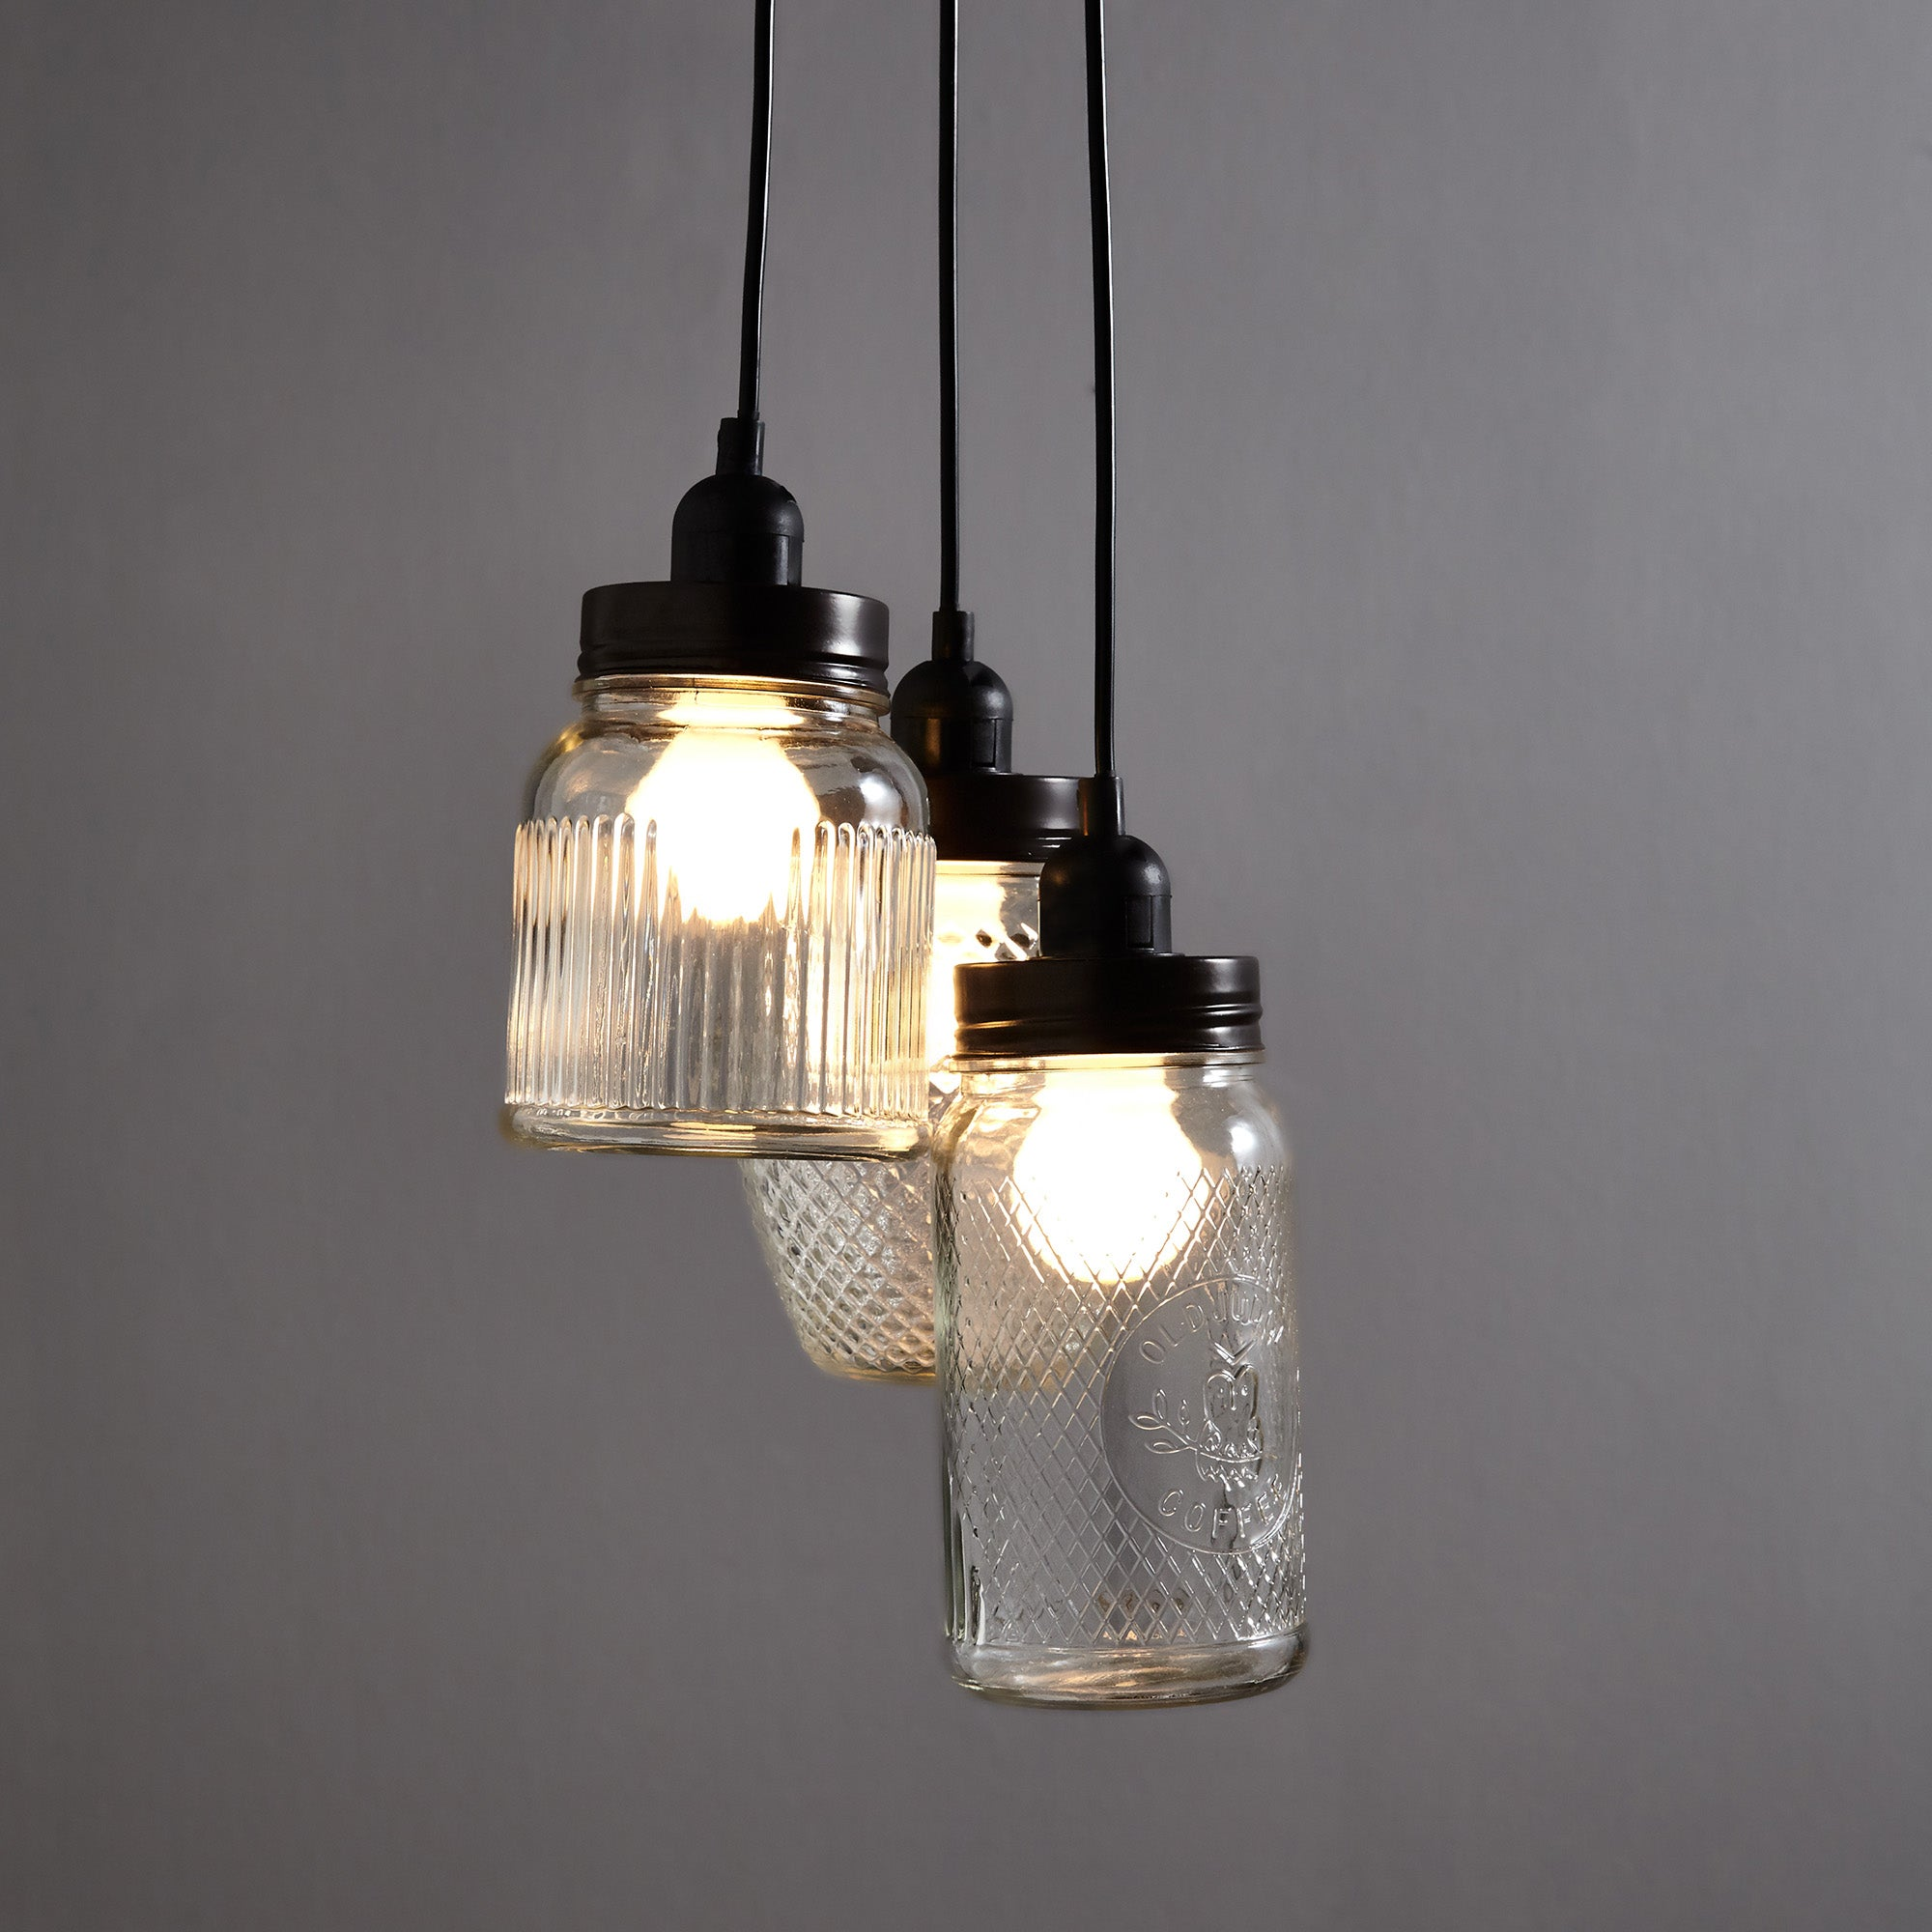 Glass Jar 3 Light Cluster